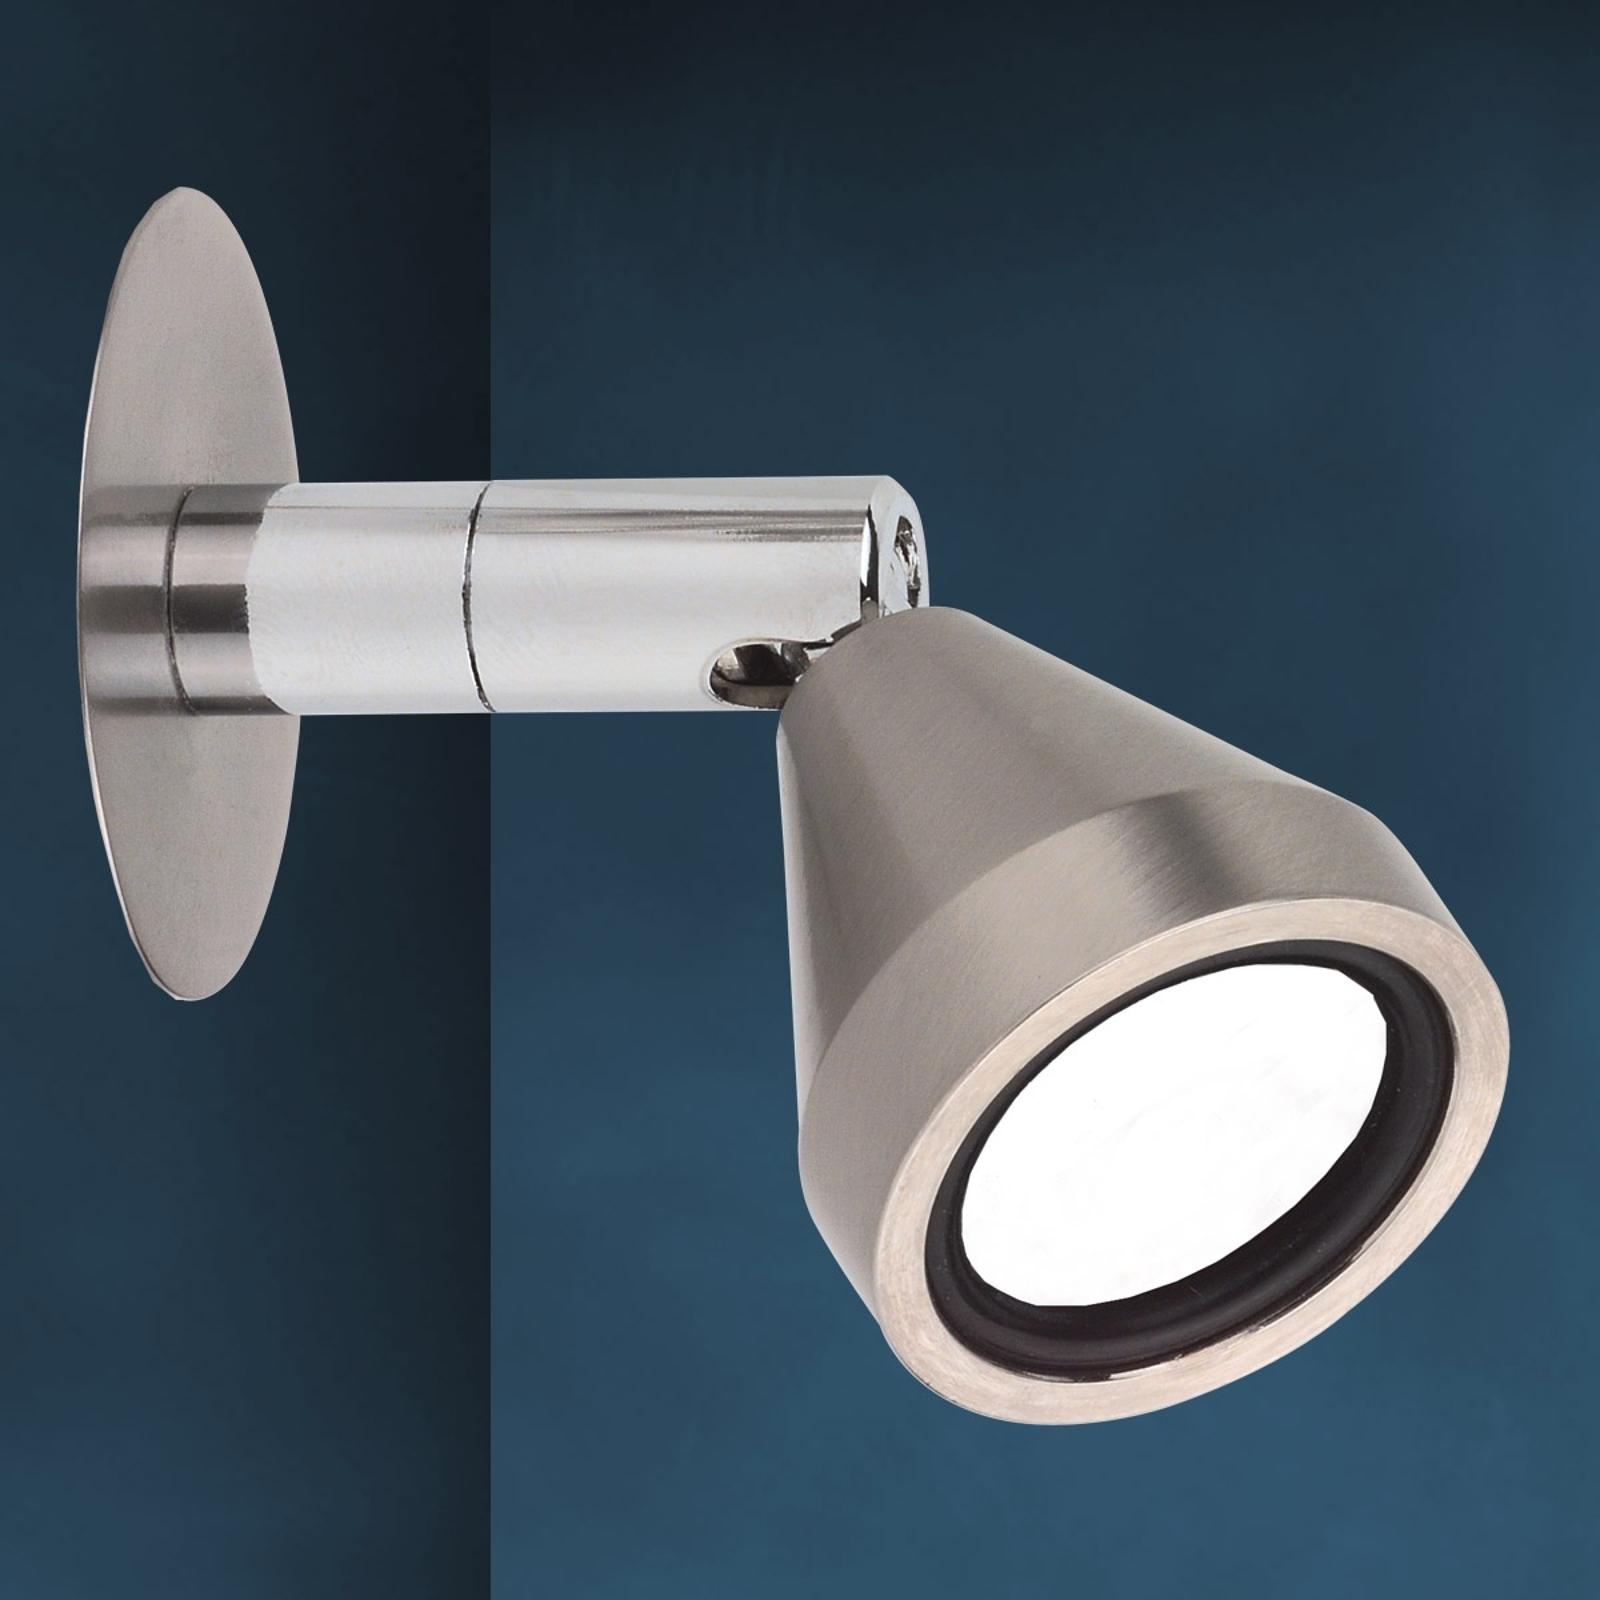 Lámpara semiempotrada LED MINI, blanco universal